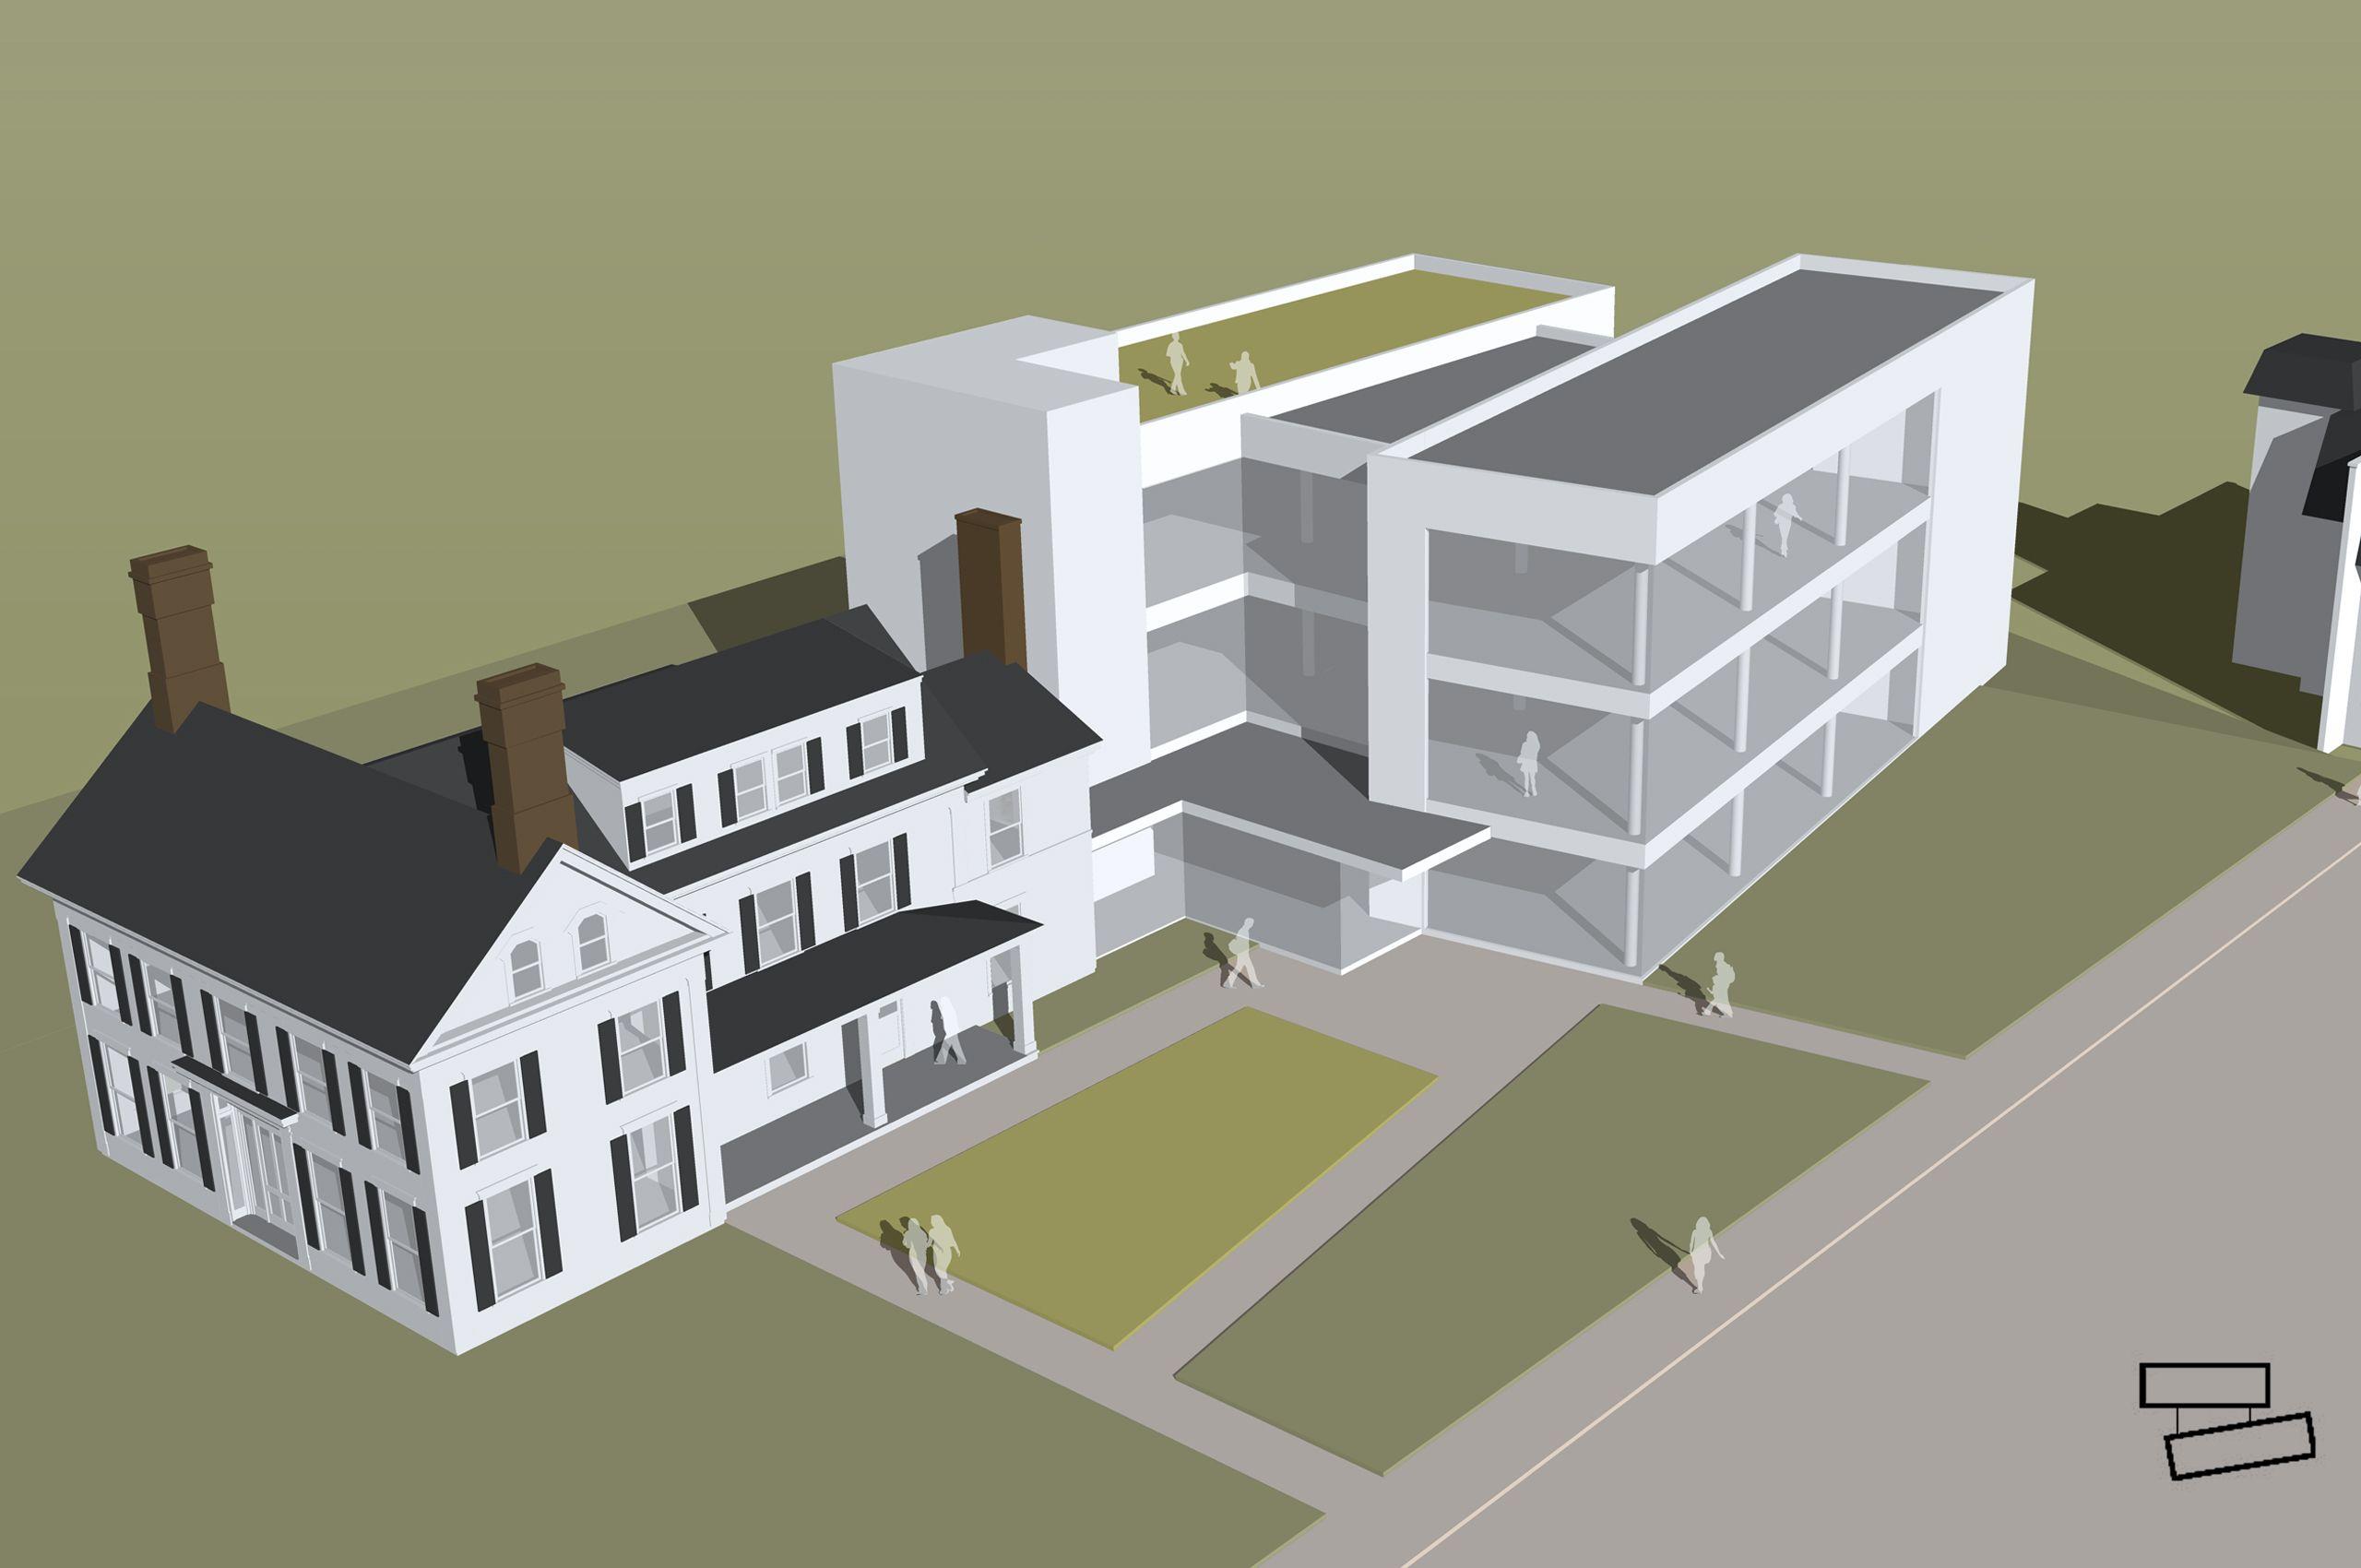 BowdoinCollege-Brunswick-ME-Scheme3-aerial-perspective.jpg